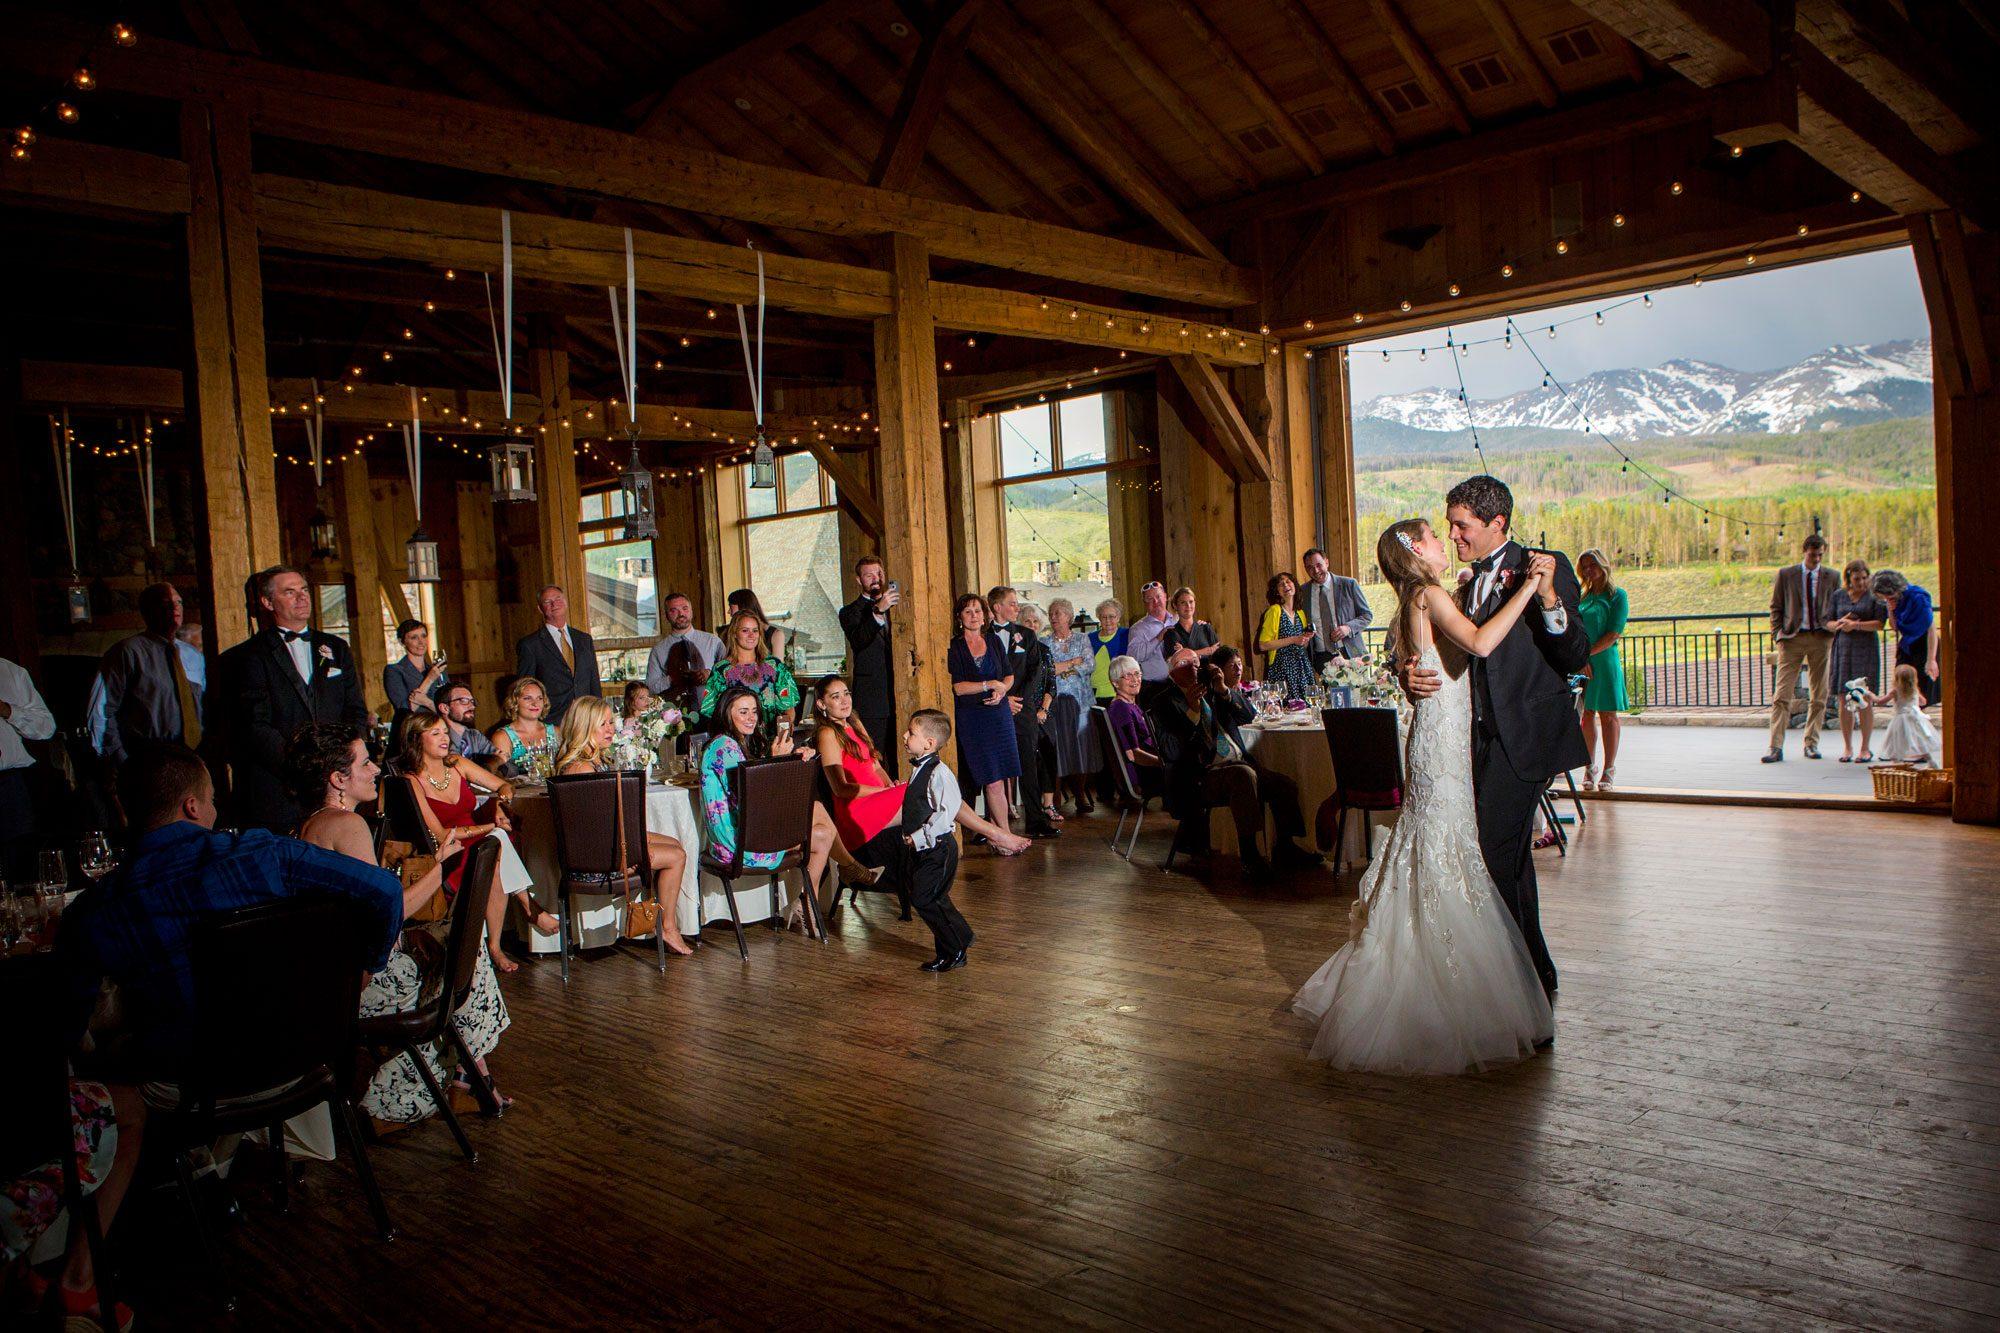 A Magical Colorado Ranch Wedding. Photographer: David Lynn Photography Event Planner & Design: JA Special Events |  Floral Designer: Statice Floral | Venue: Devil's Thumb Ranch